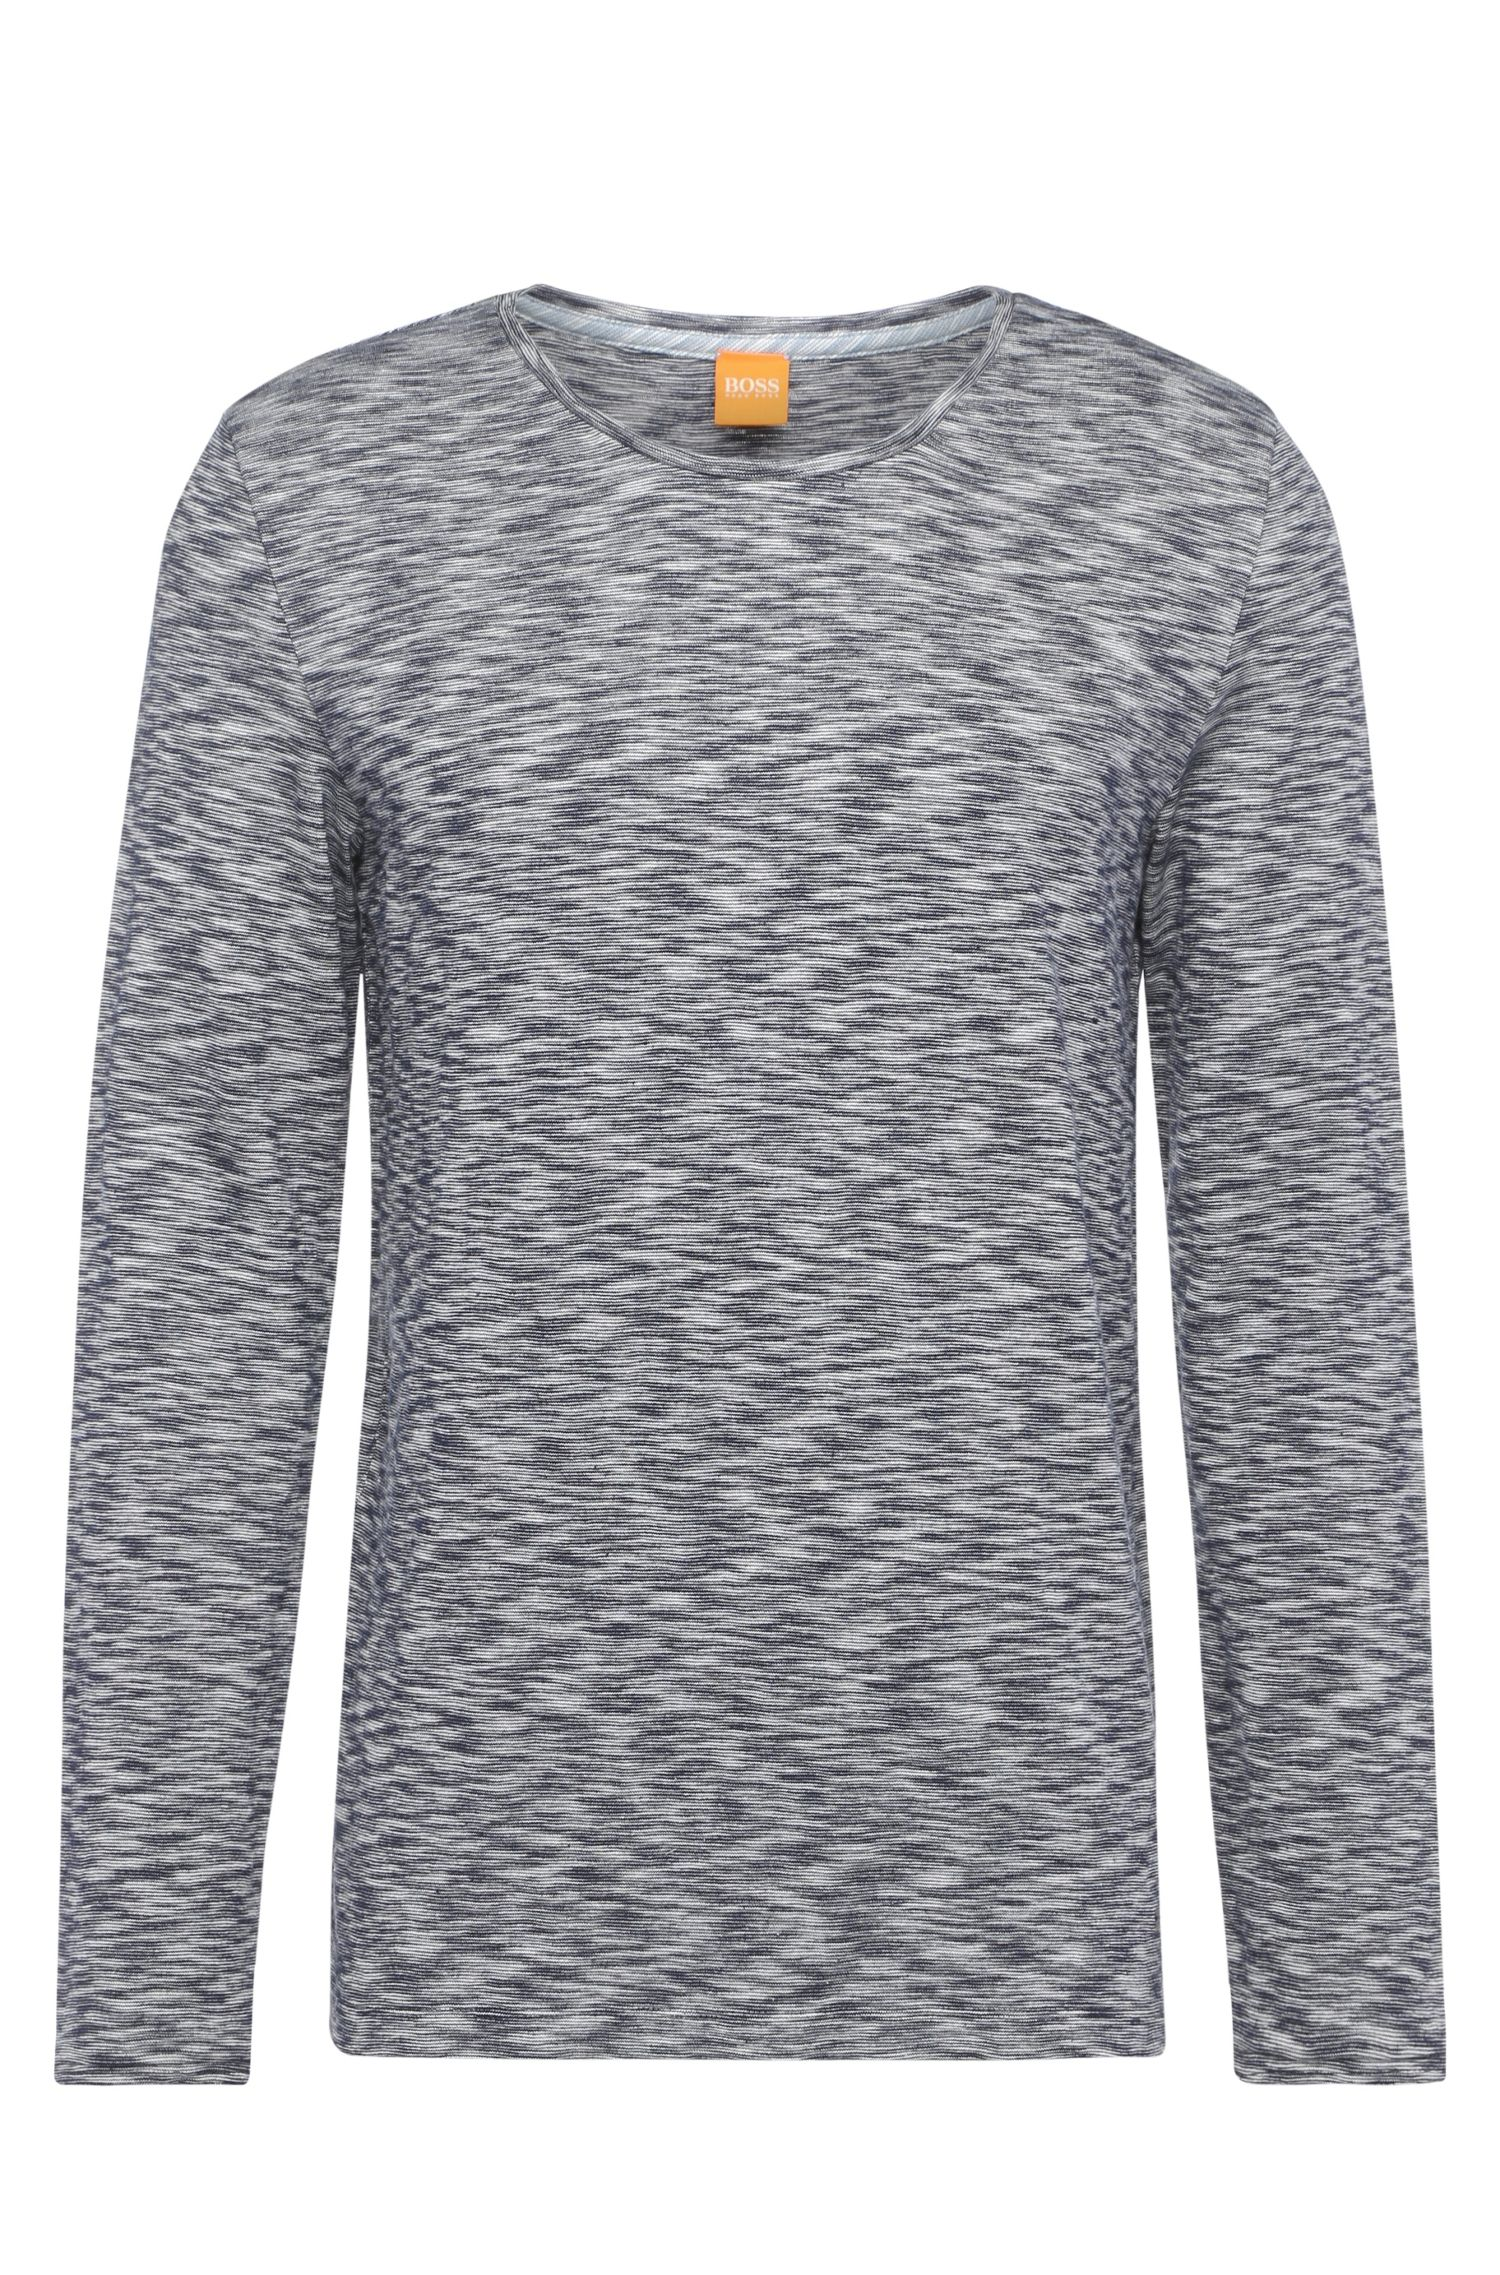 Comfort-Fit Longsleeve aus Baumwolle mit markanter Melierung: ´Tyner`